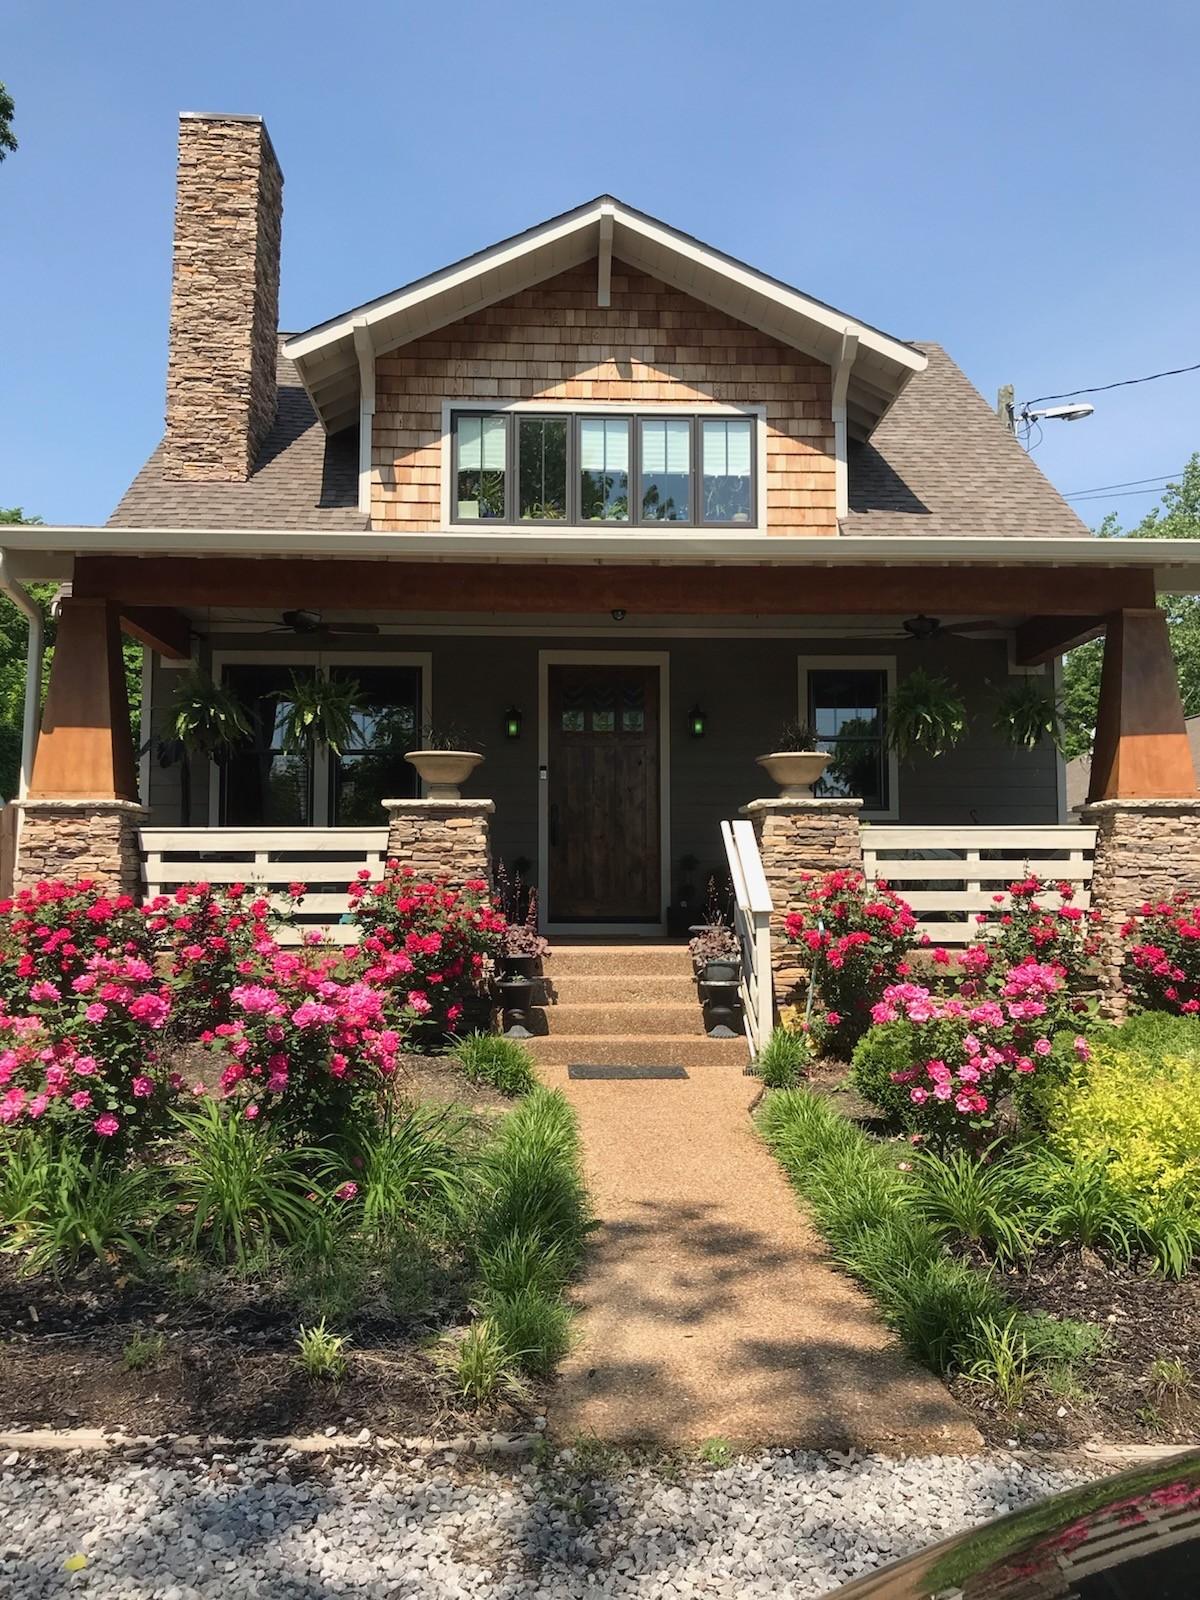 4000B Hutson Ave, Nashville, TN 37216 - Nashville, TN real estate listing